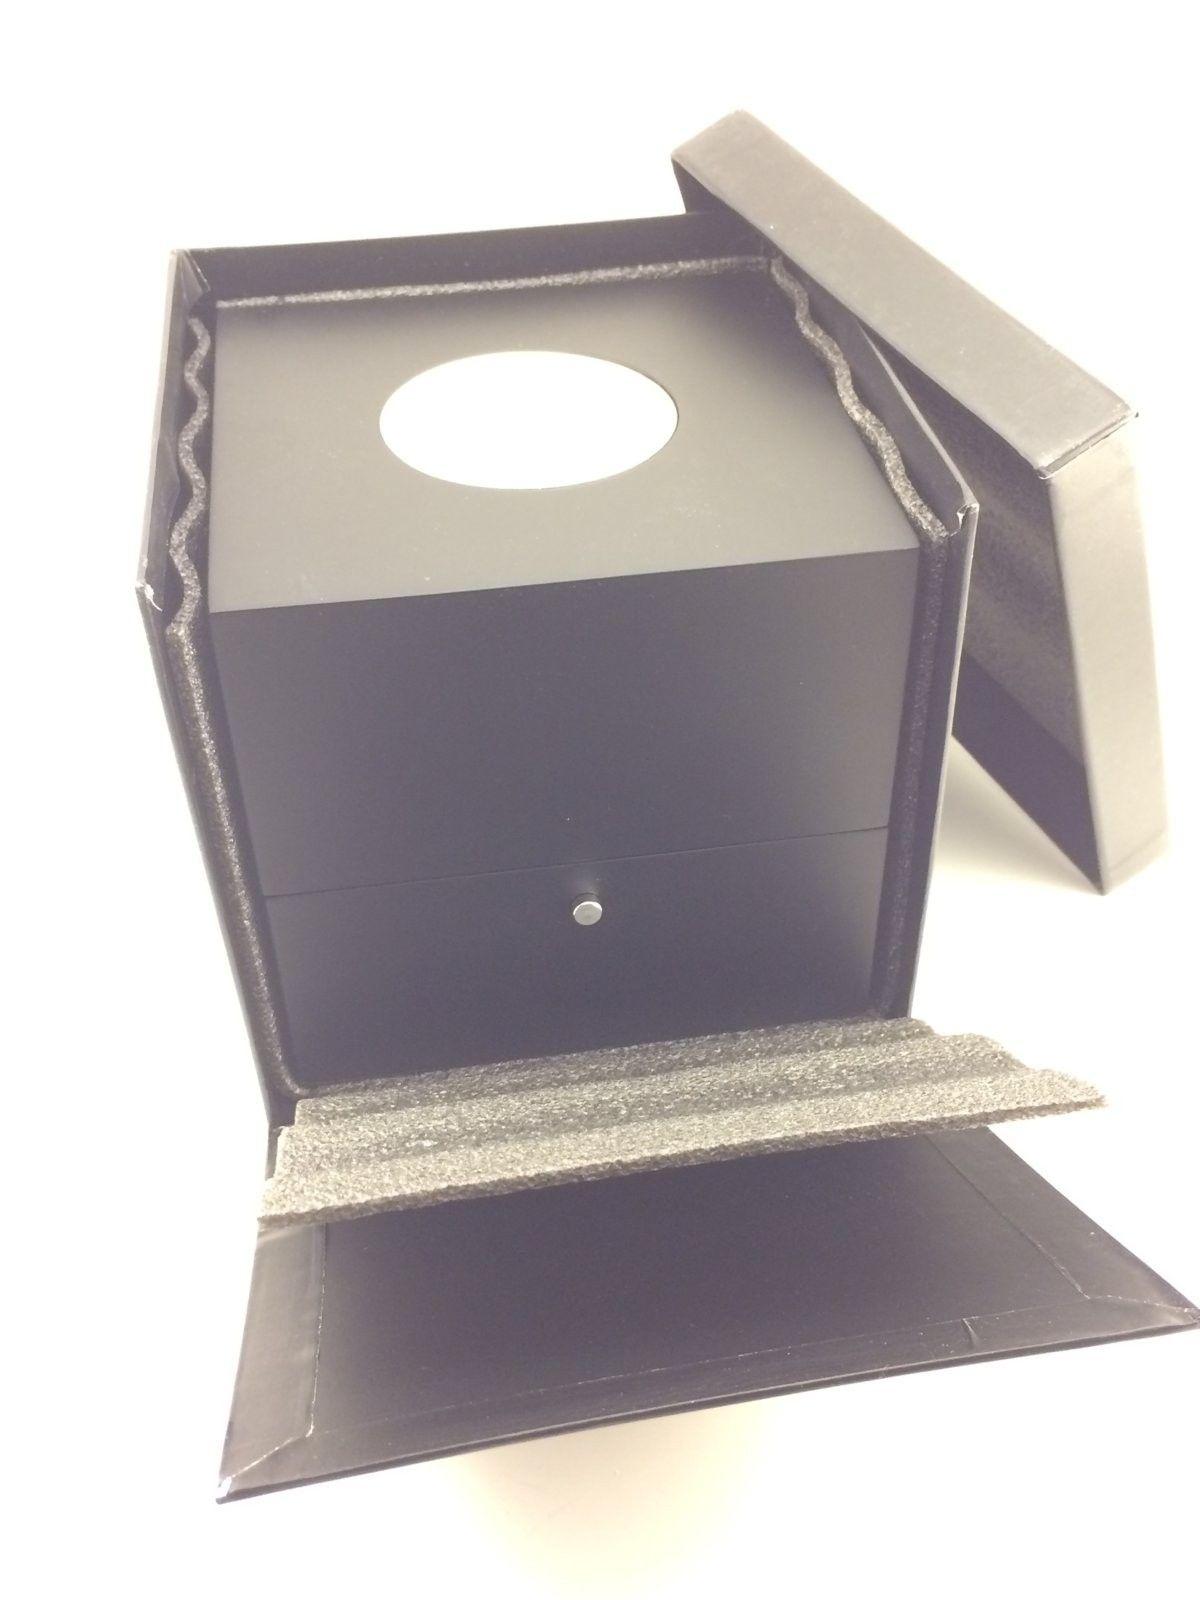 Minute Machine Wooden Box - MM box 707.JPG